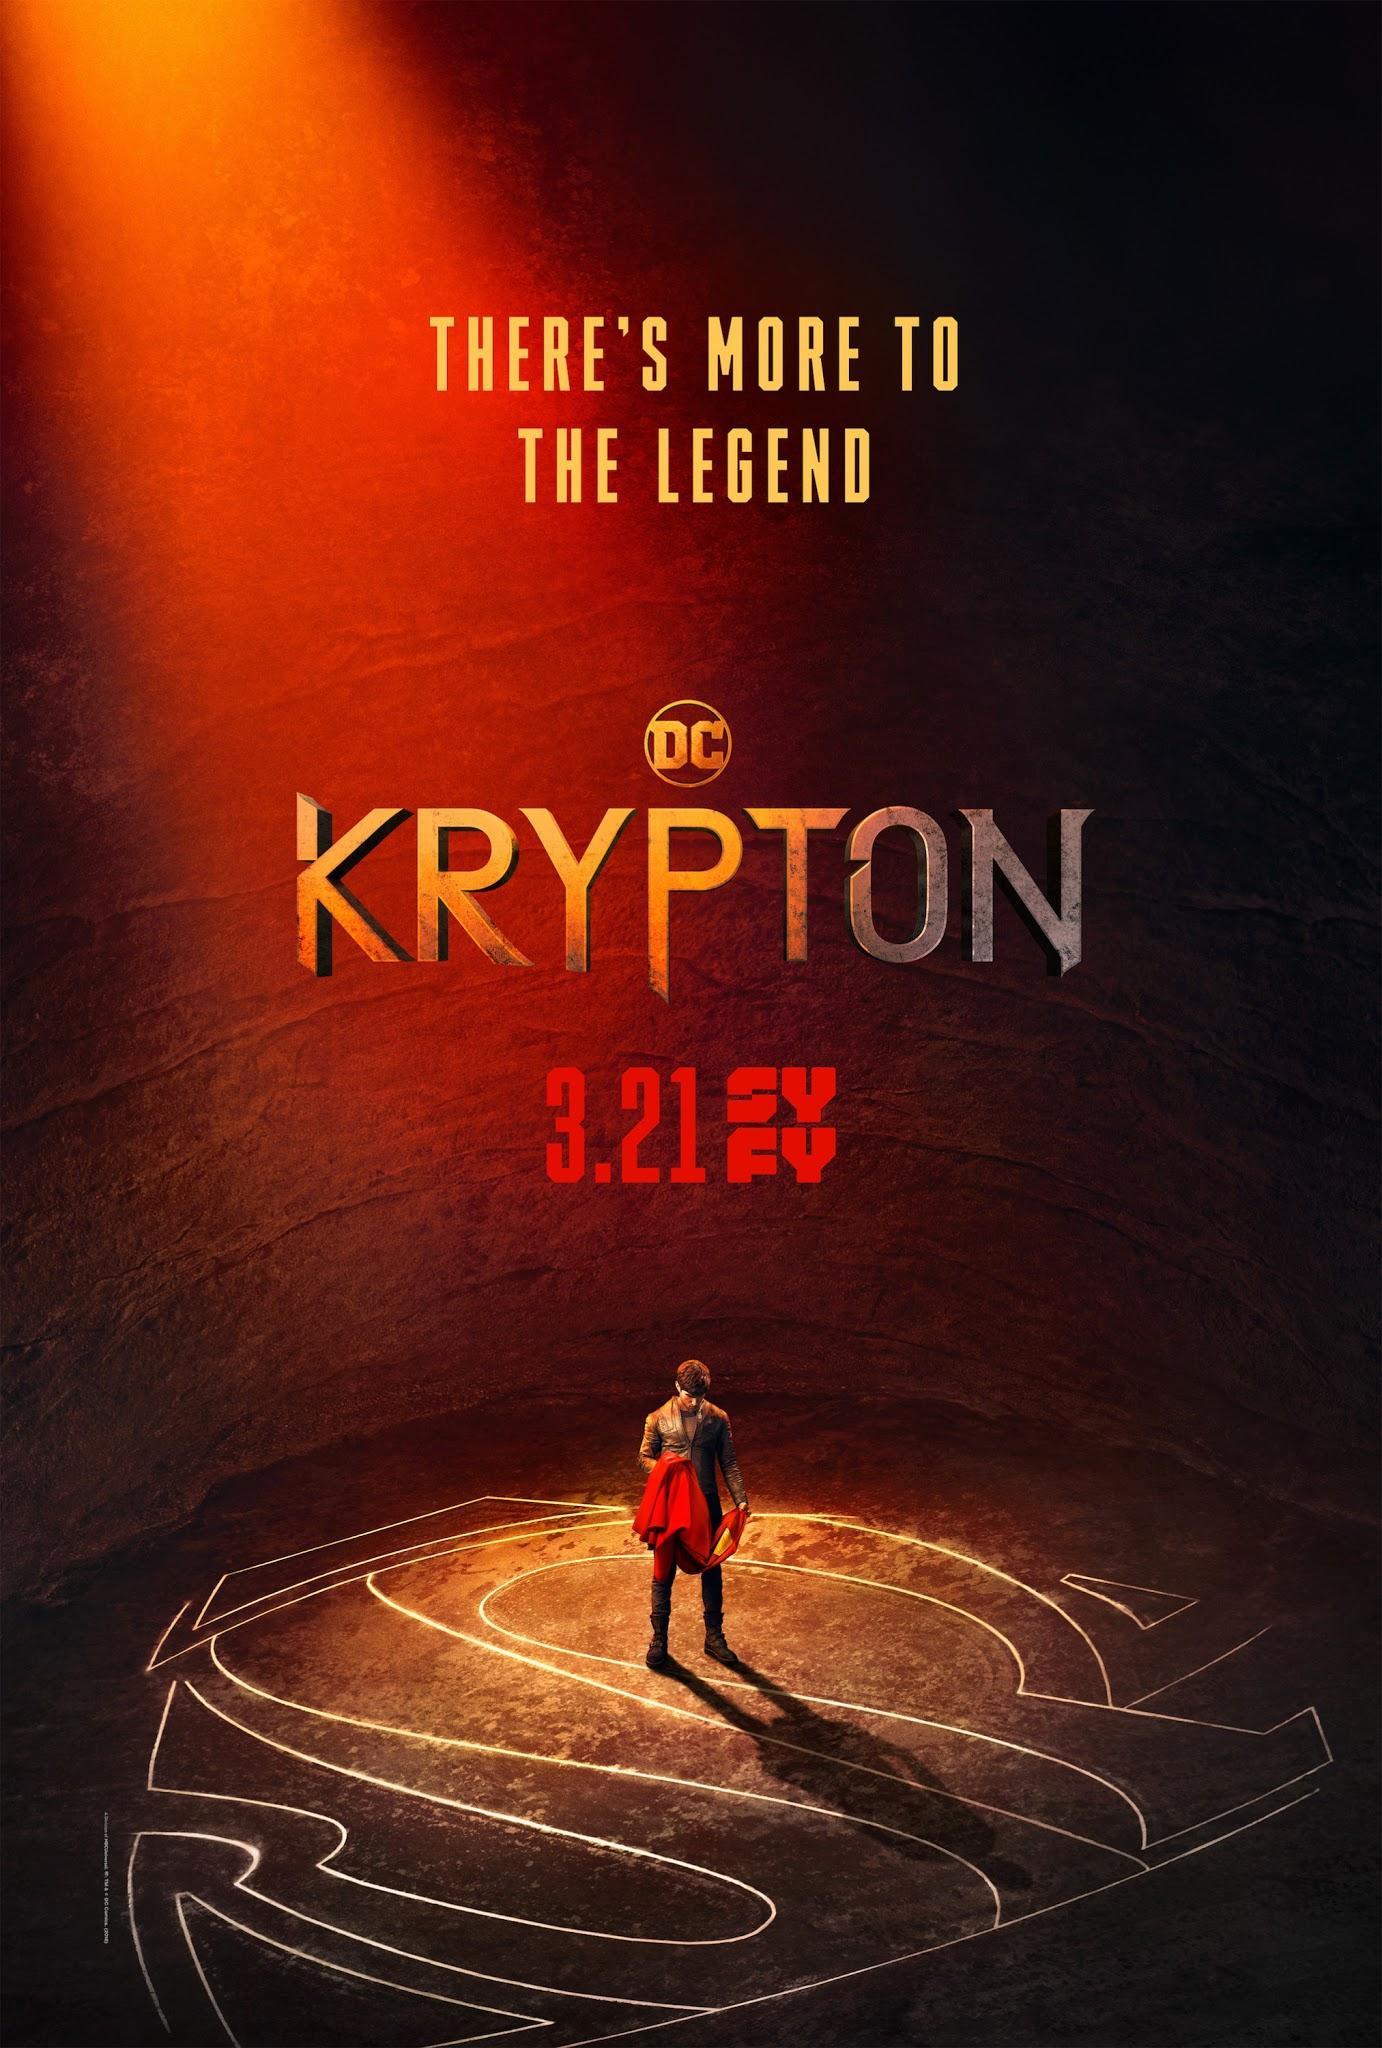 Krypton S01E05 HD 720p – 480p [English] Multi-Host